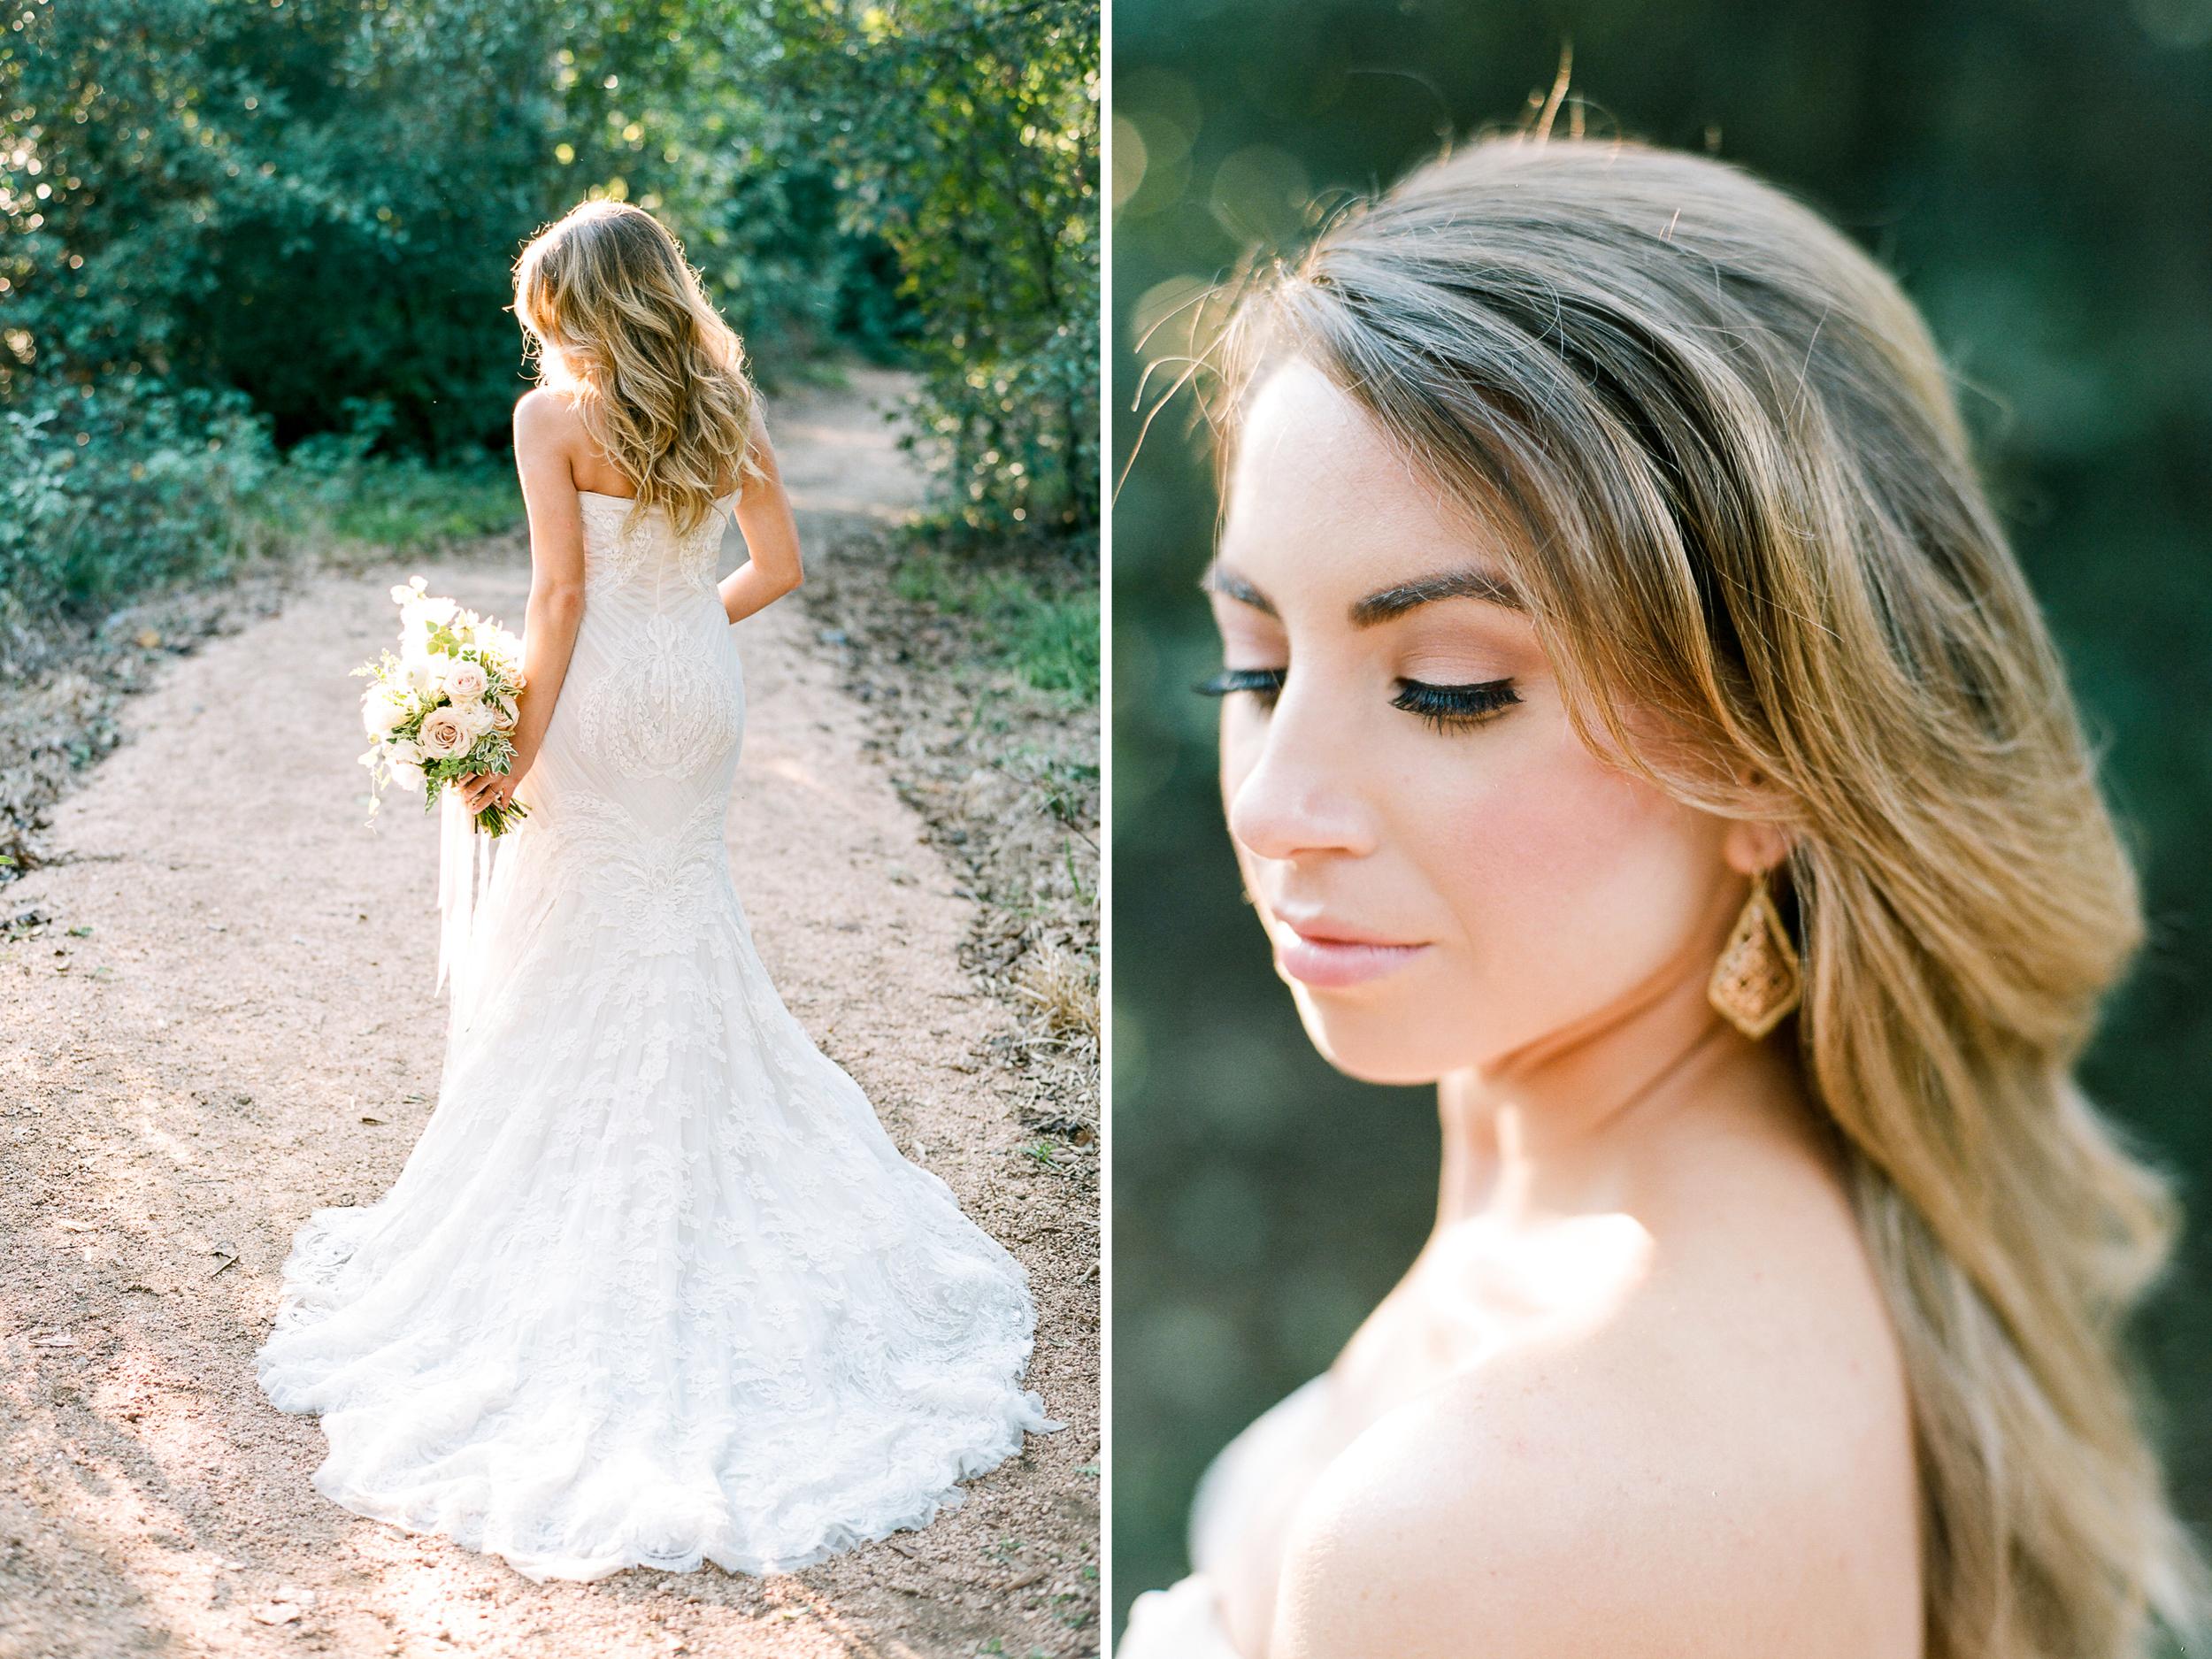 dana-fernandez-photography-the-wedding-chicks-film-houston-wedding-photography-destination-108.jpg